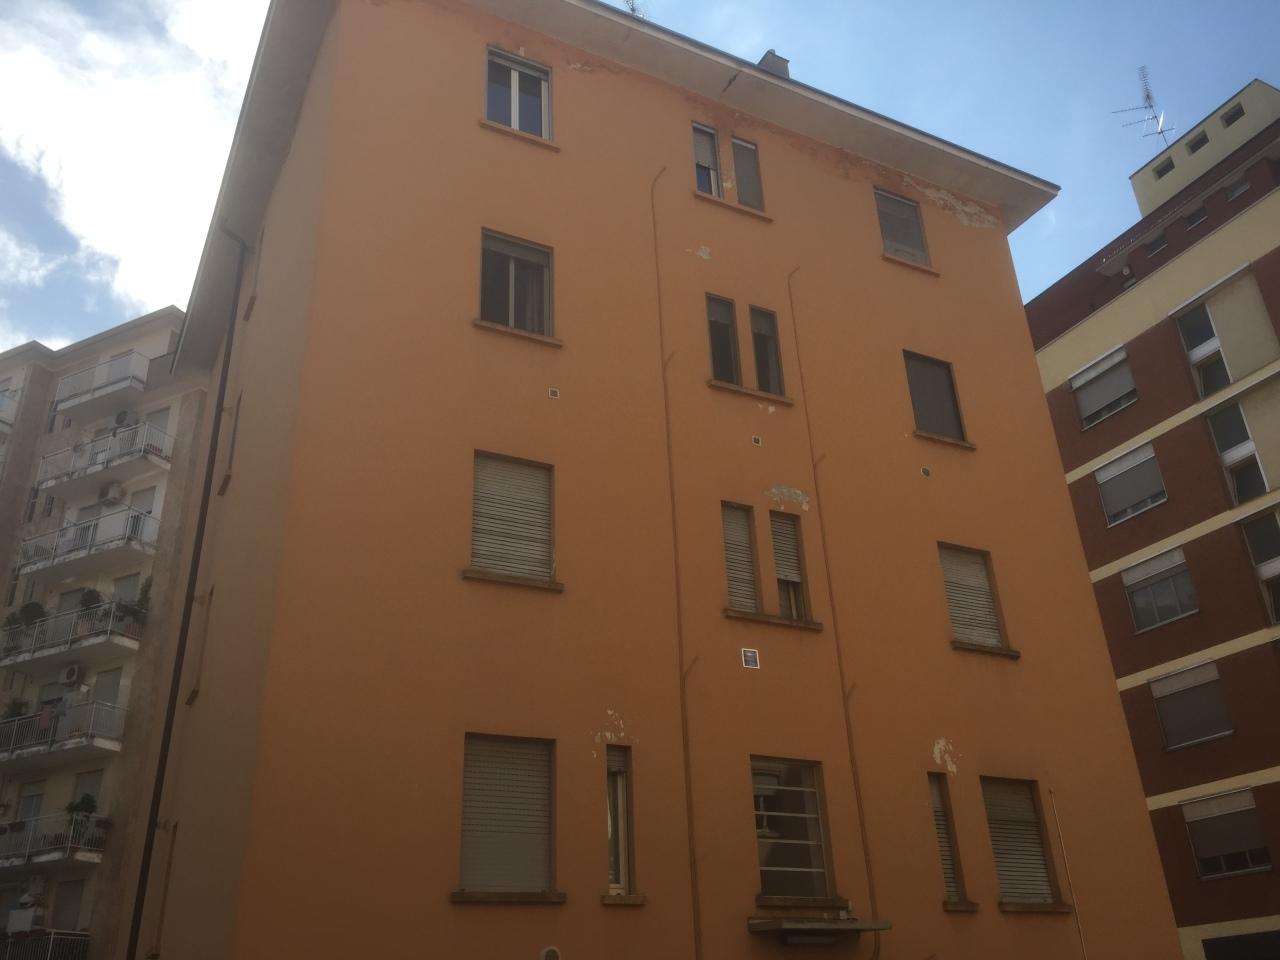 Bilocale Novara Via G. B. Magistrini 2 8